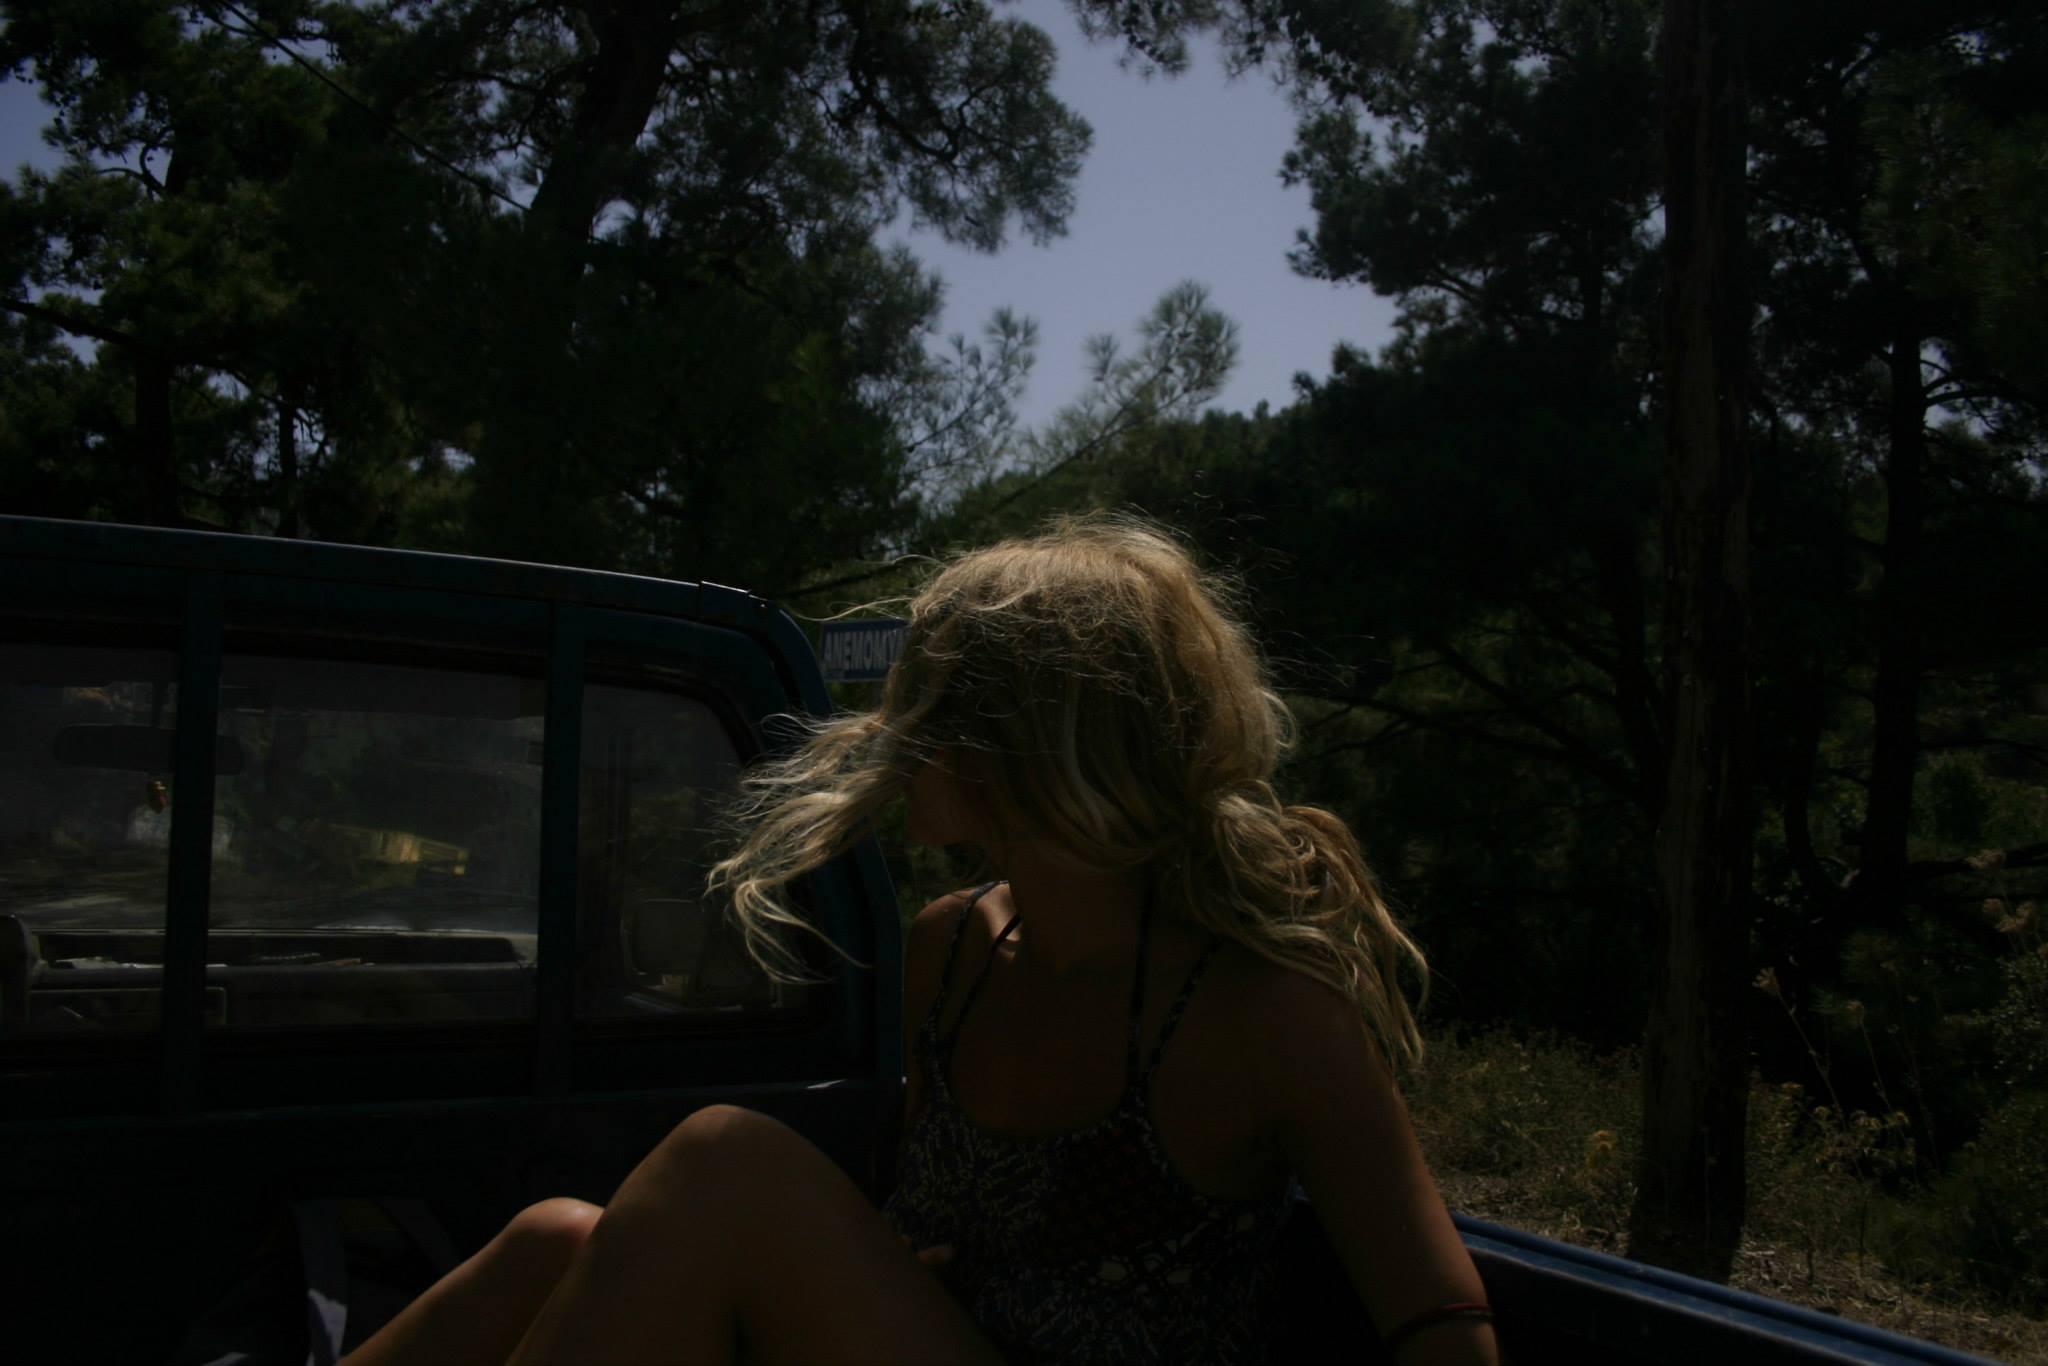 hitchhike pickup truck side 2